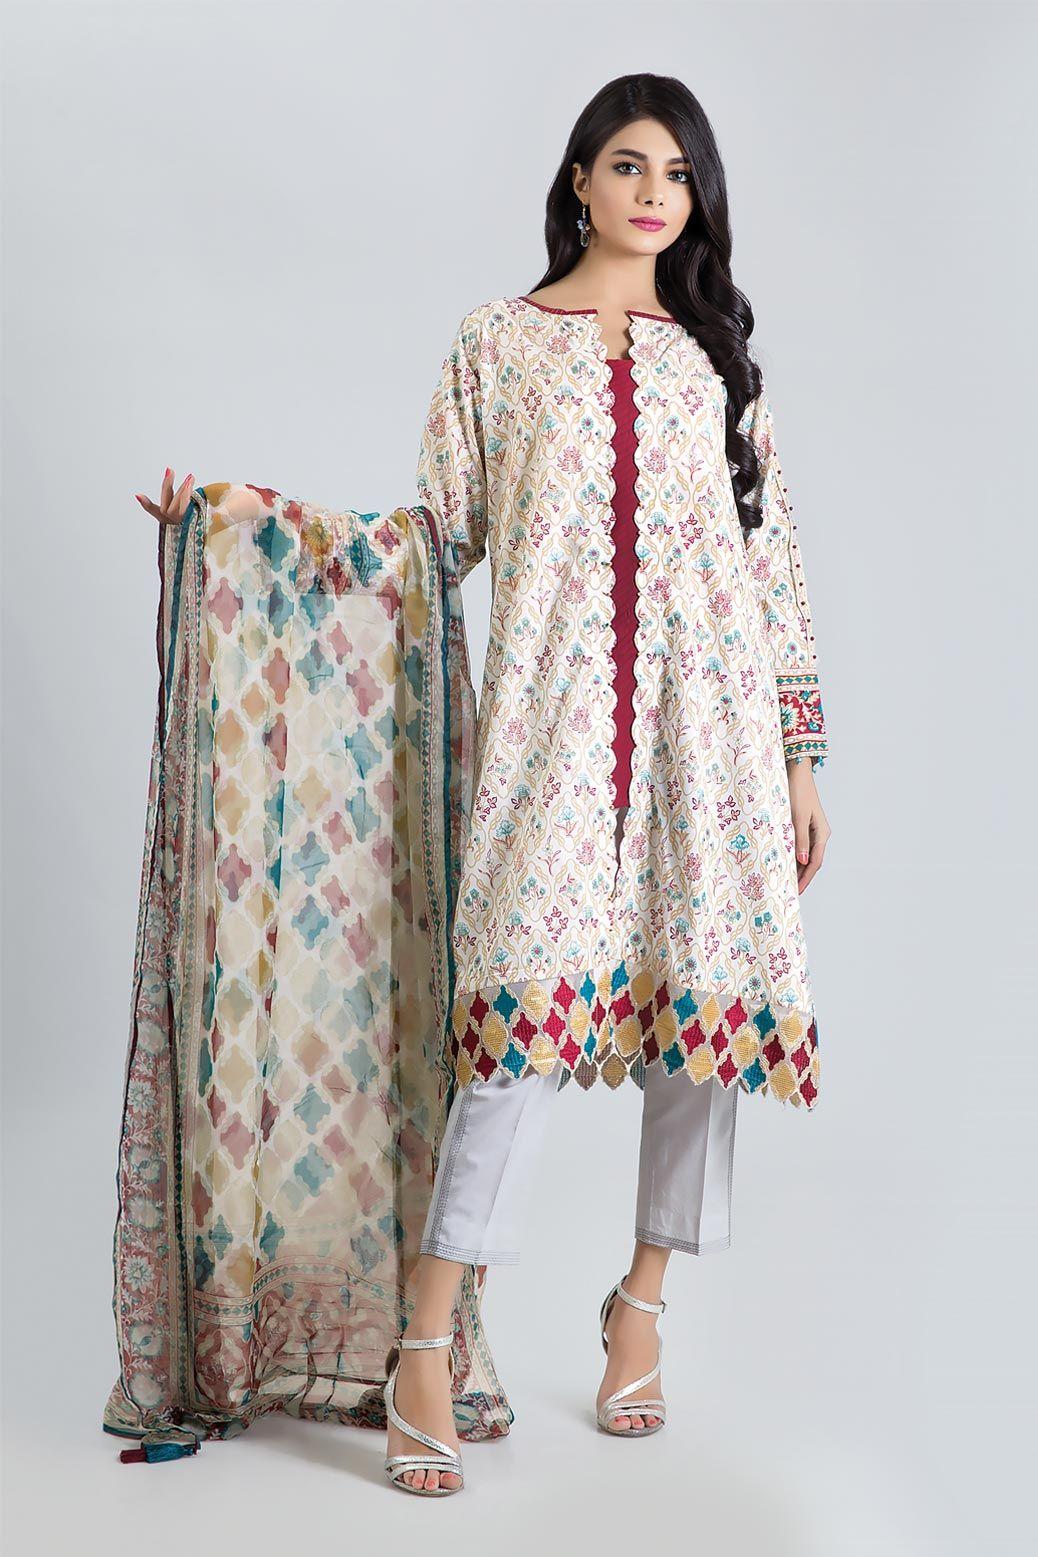 Bonanza Satrangi Eid Collection